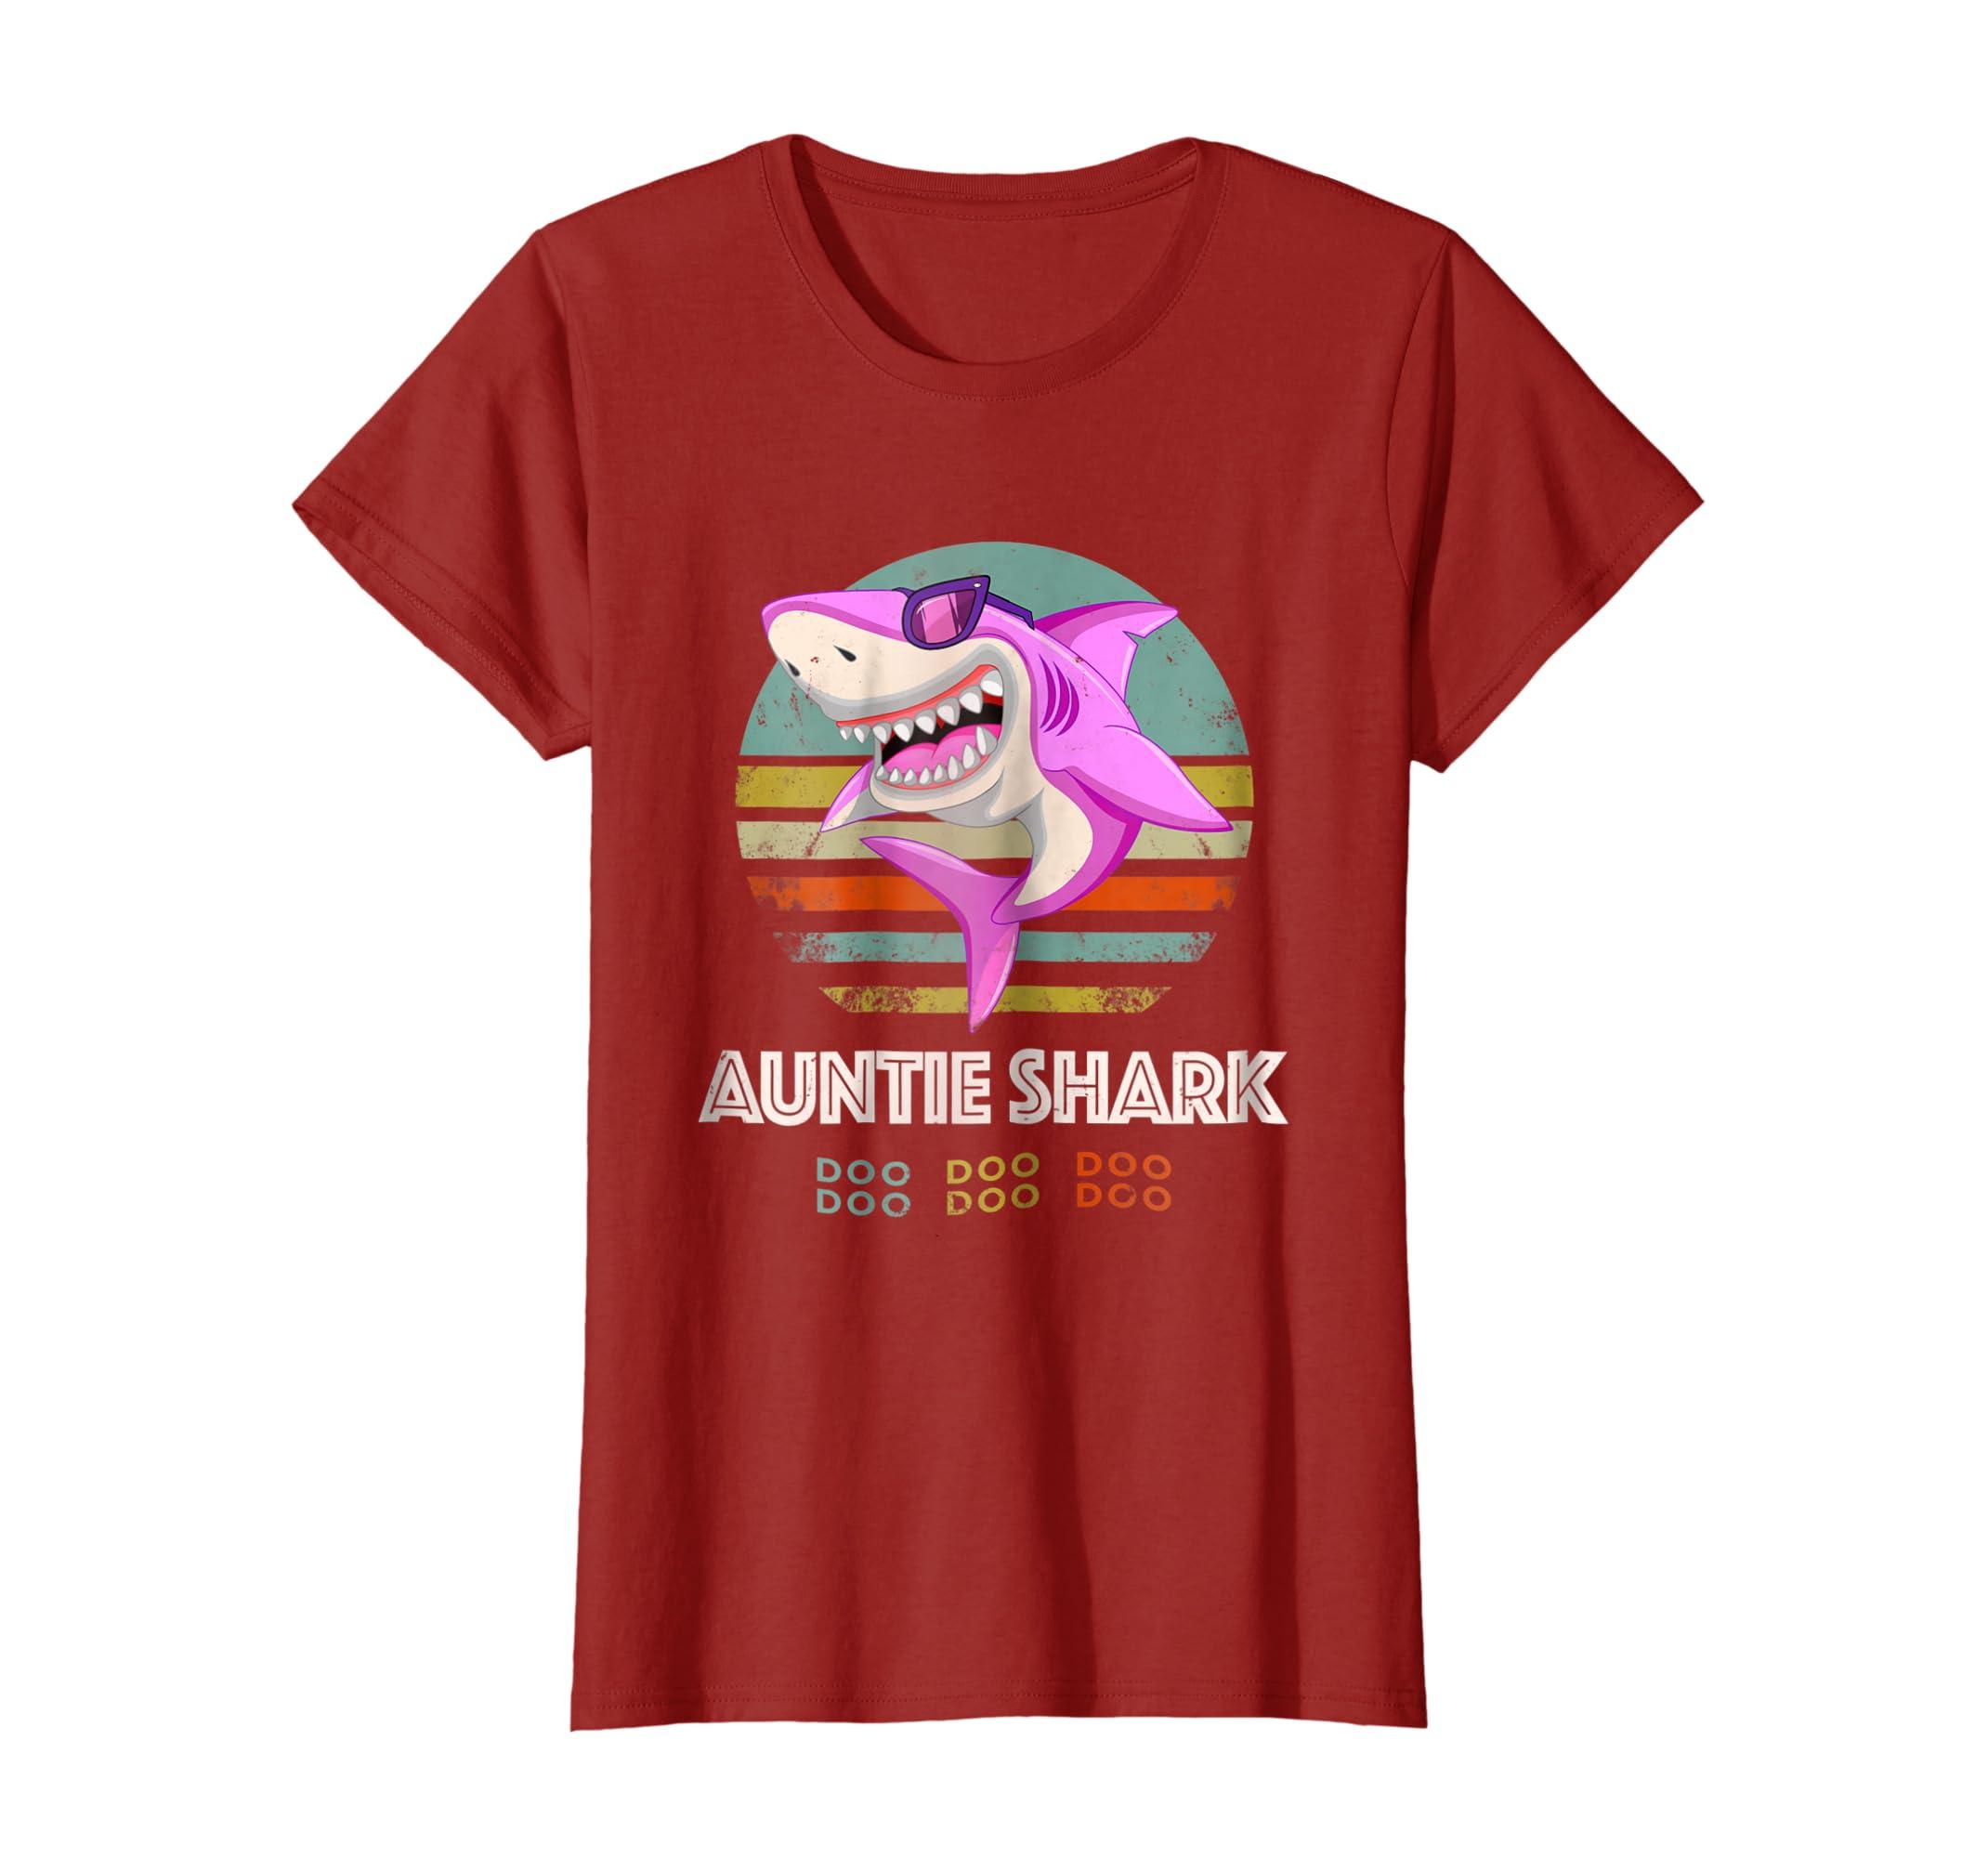 Retro Vintage Auntie Shark Tshirt Birthday Gift Costume Teechatpro